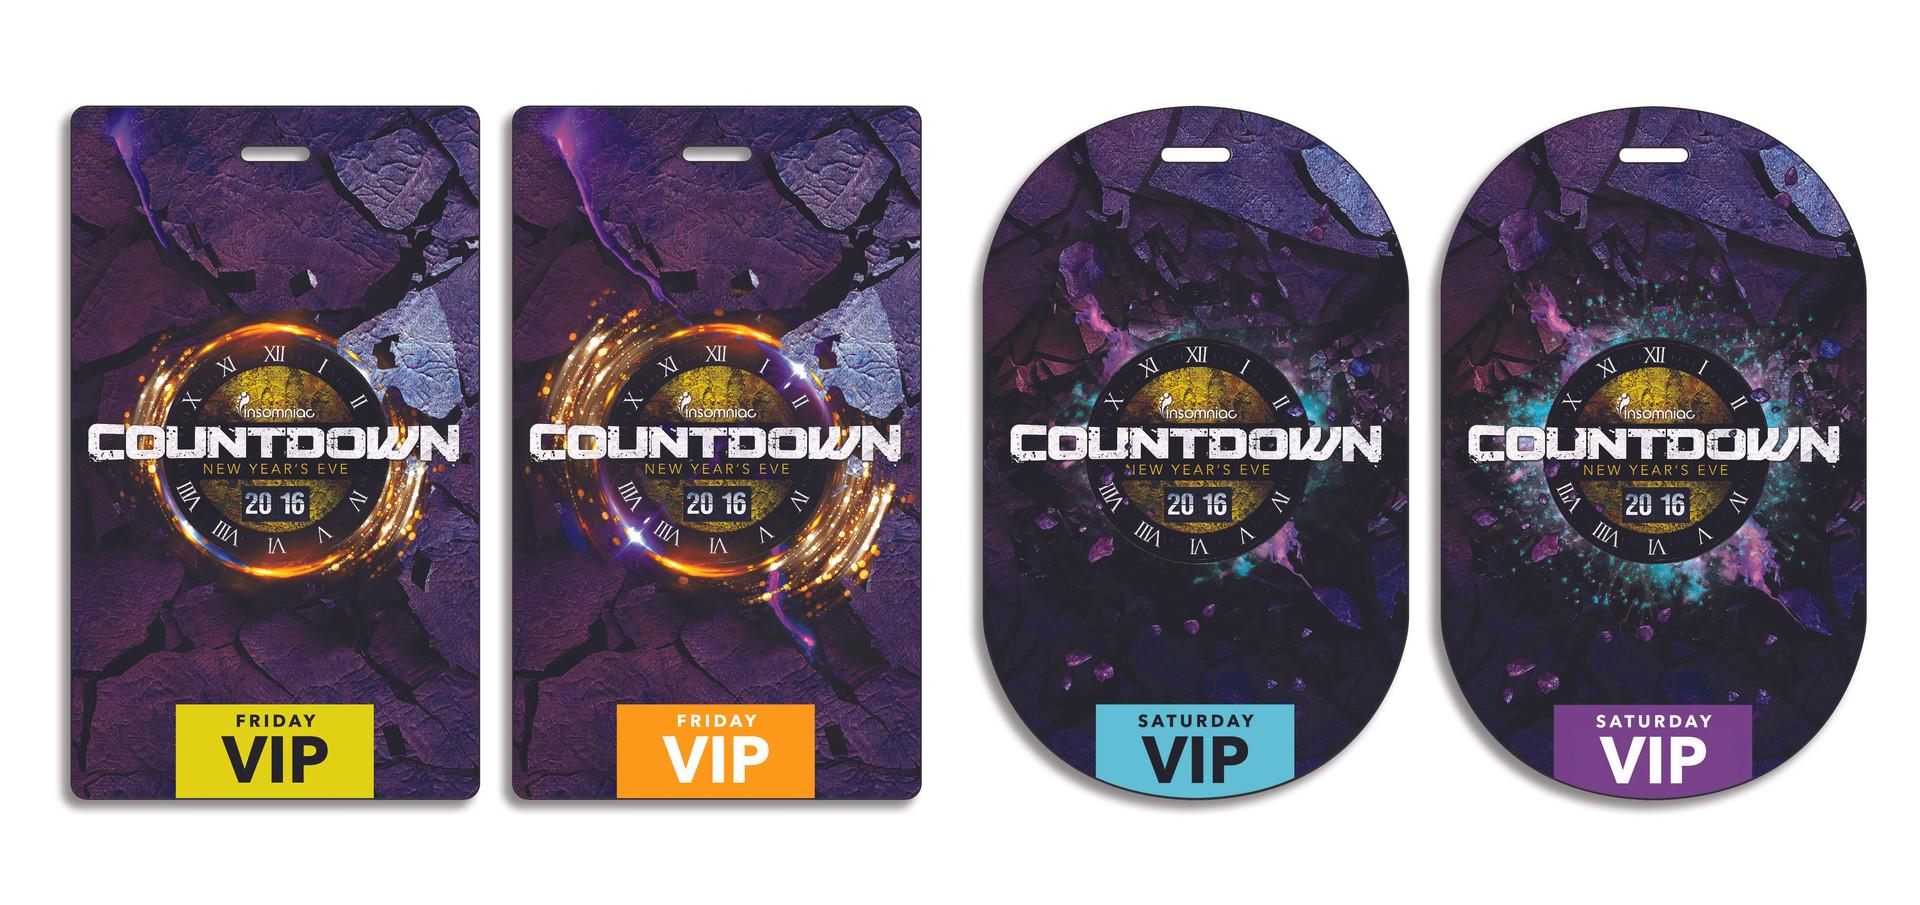 COUNTDOWN LENTICULAR VIP PASSES